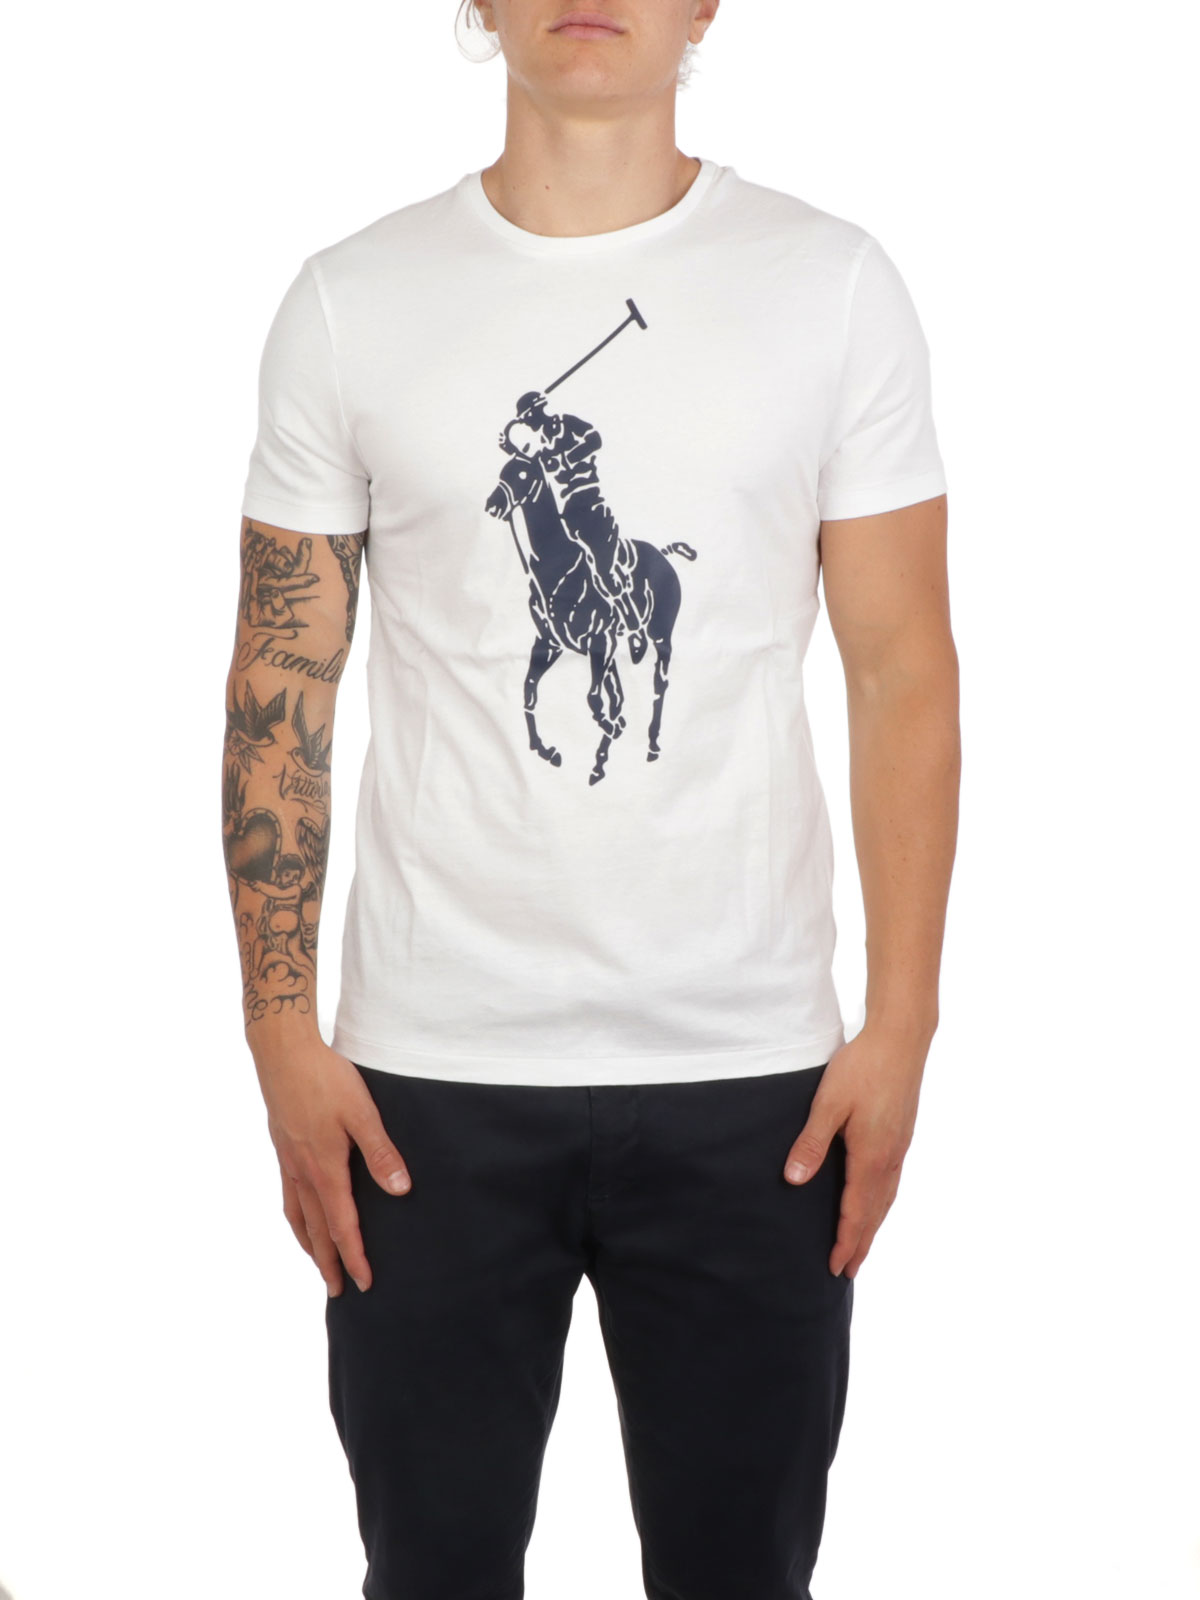 Immagine di POLO RALPH LAUREN | T-Shirt Uomo Stampa Big Pony